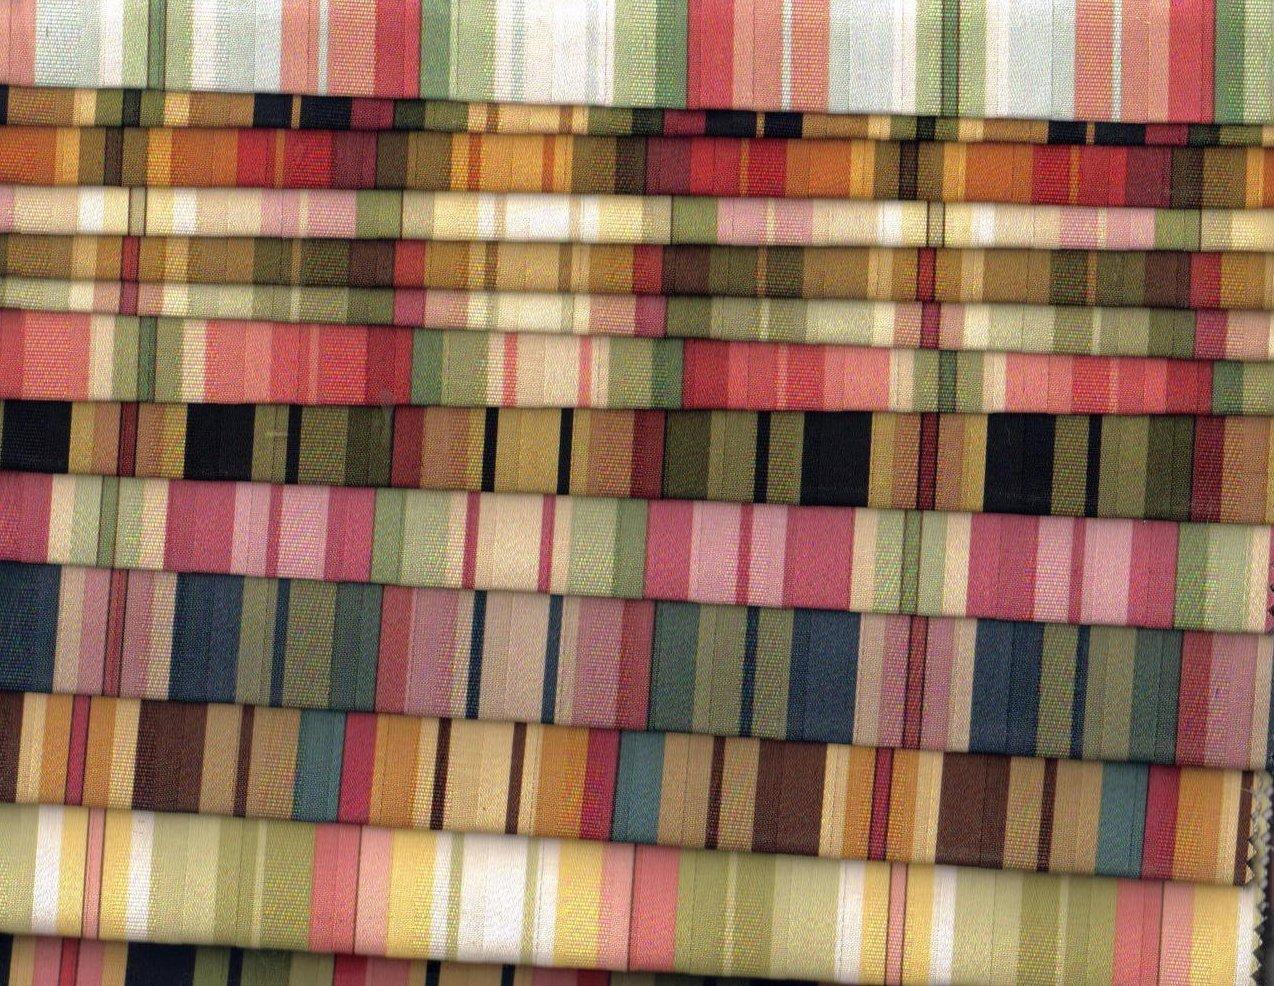 Image 2 of Mill Creek Fabrics Striped Fabrics 16 lg pcs Various Shades